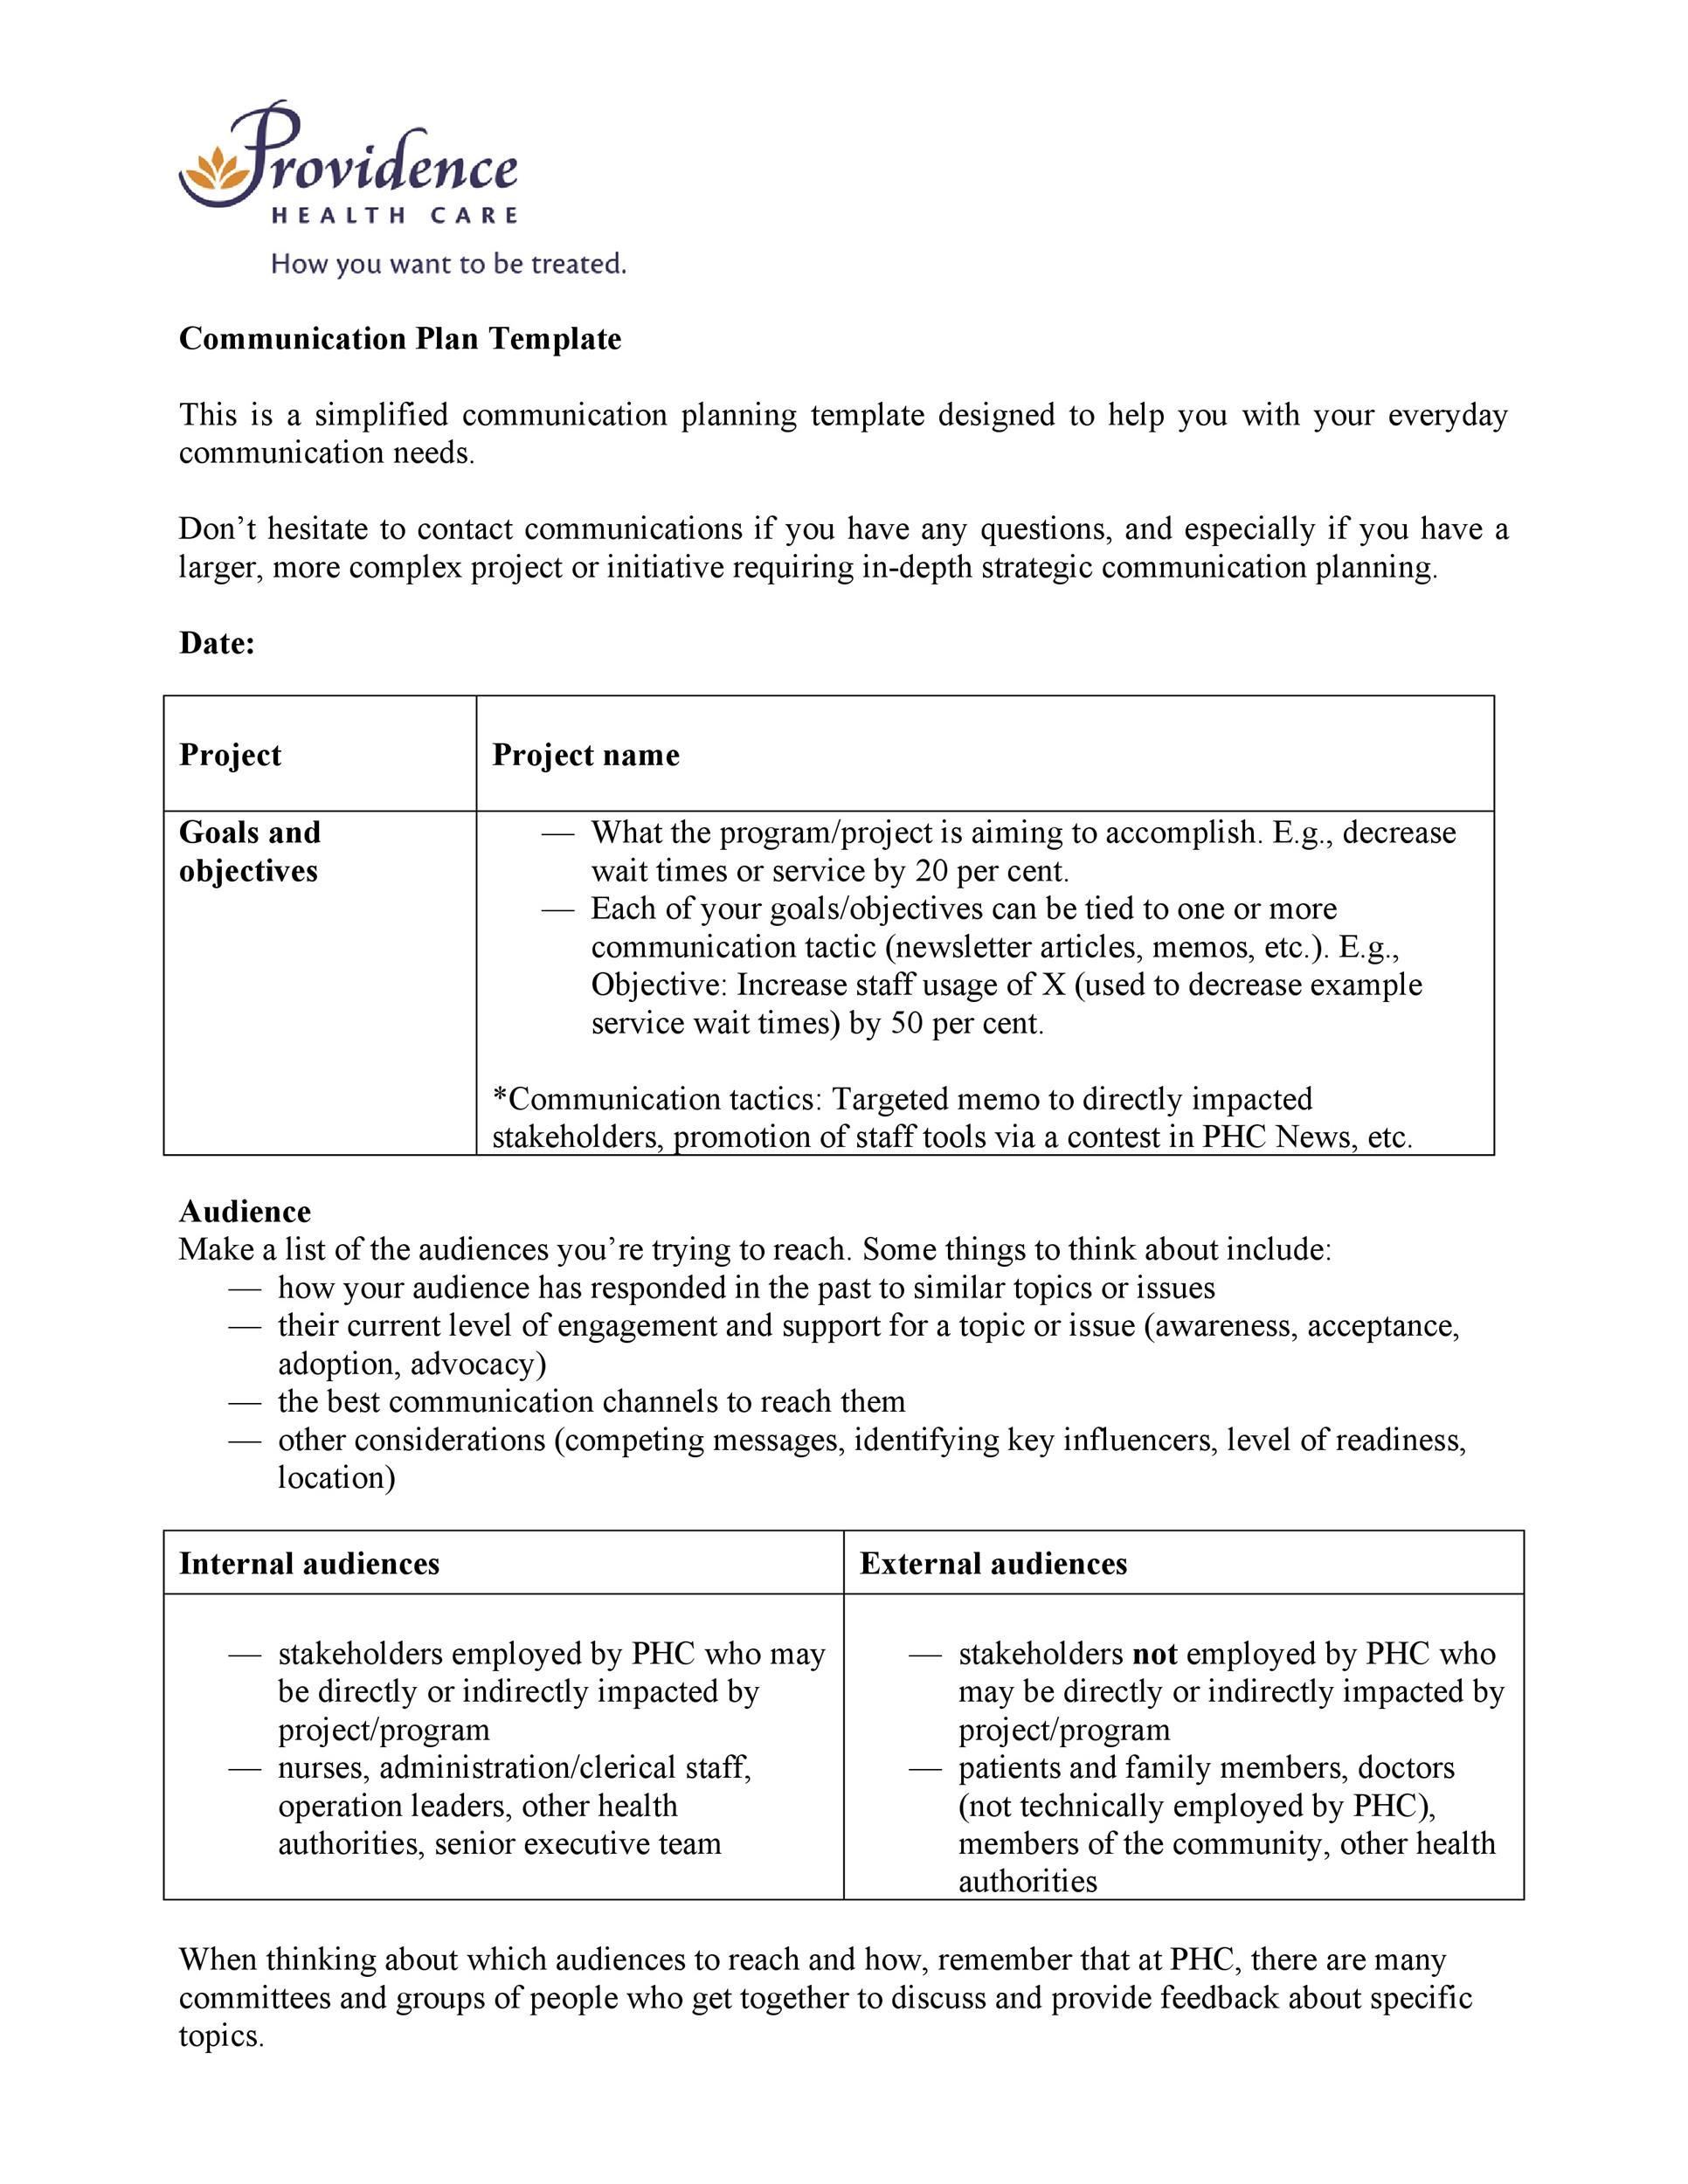 Free Communication Plan Template 26